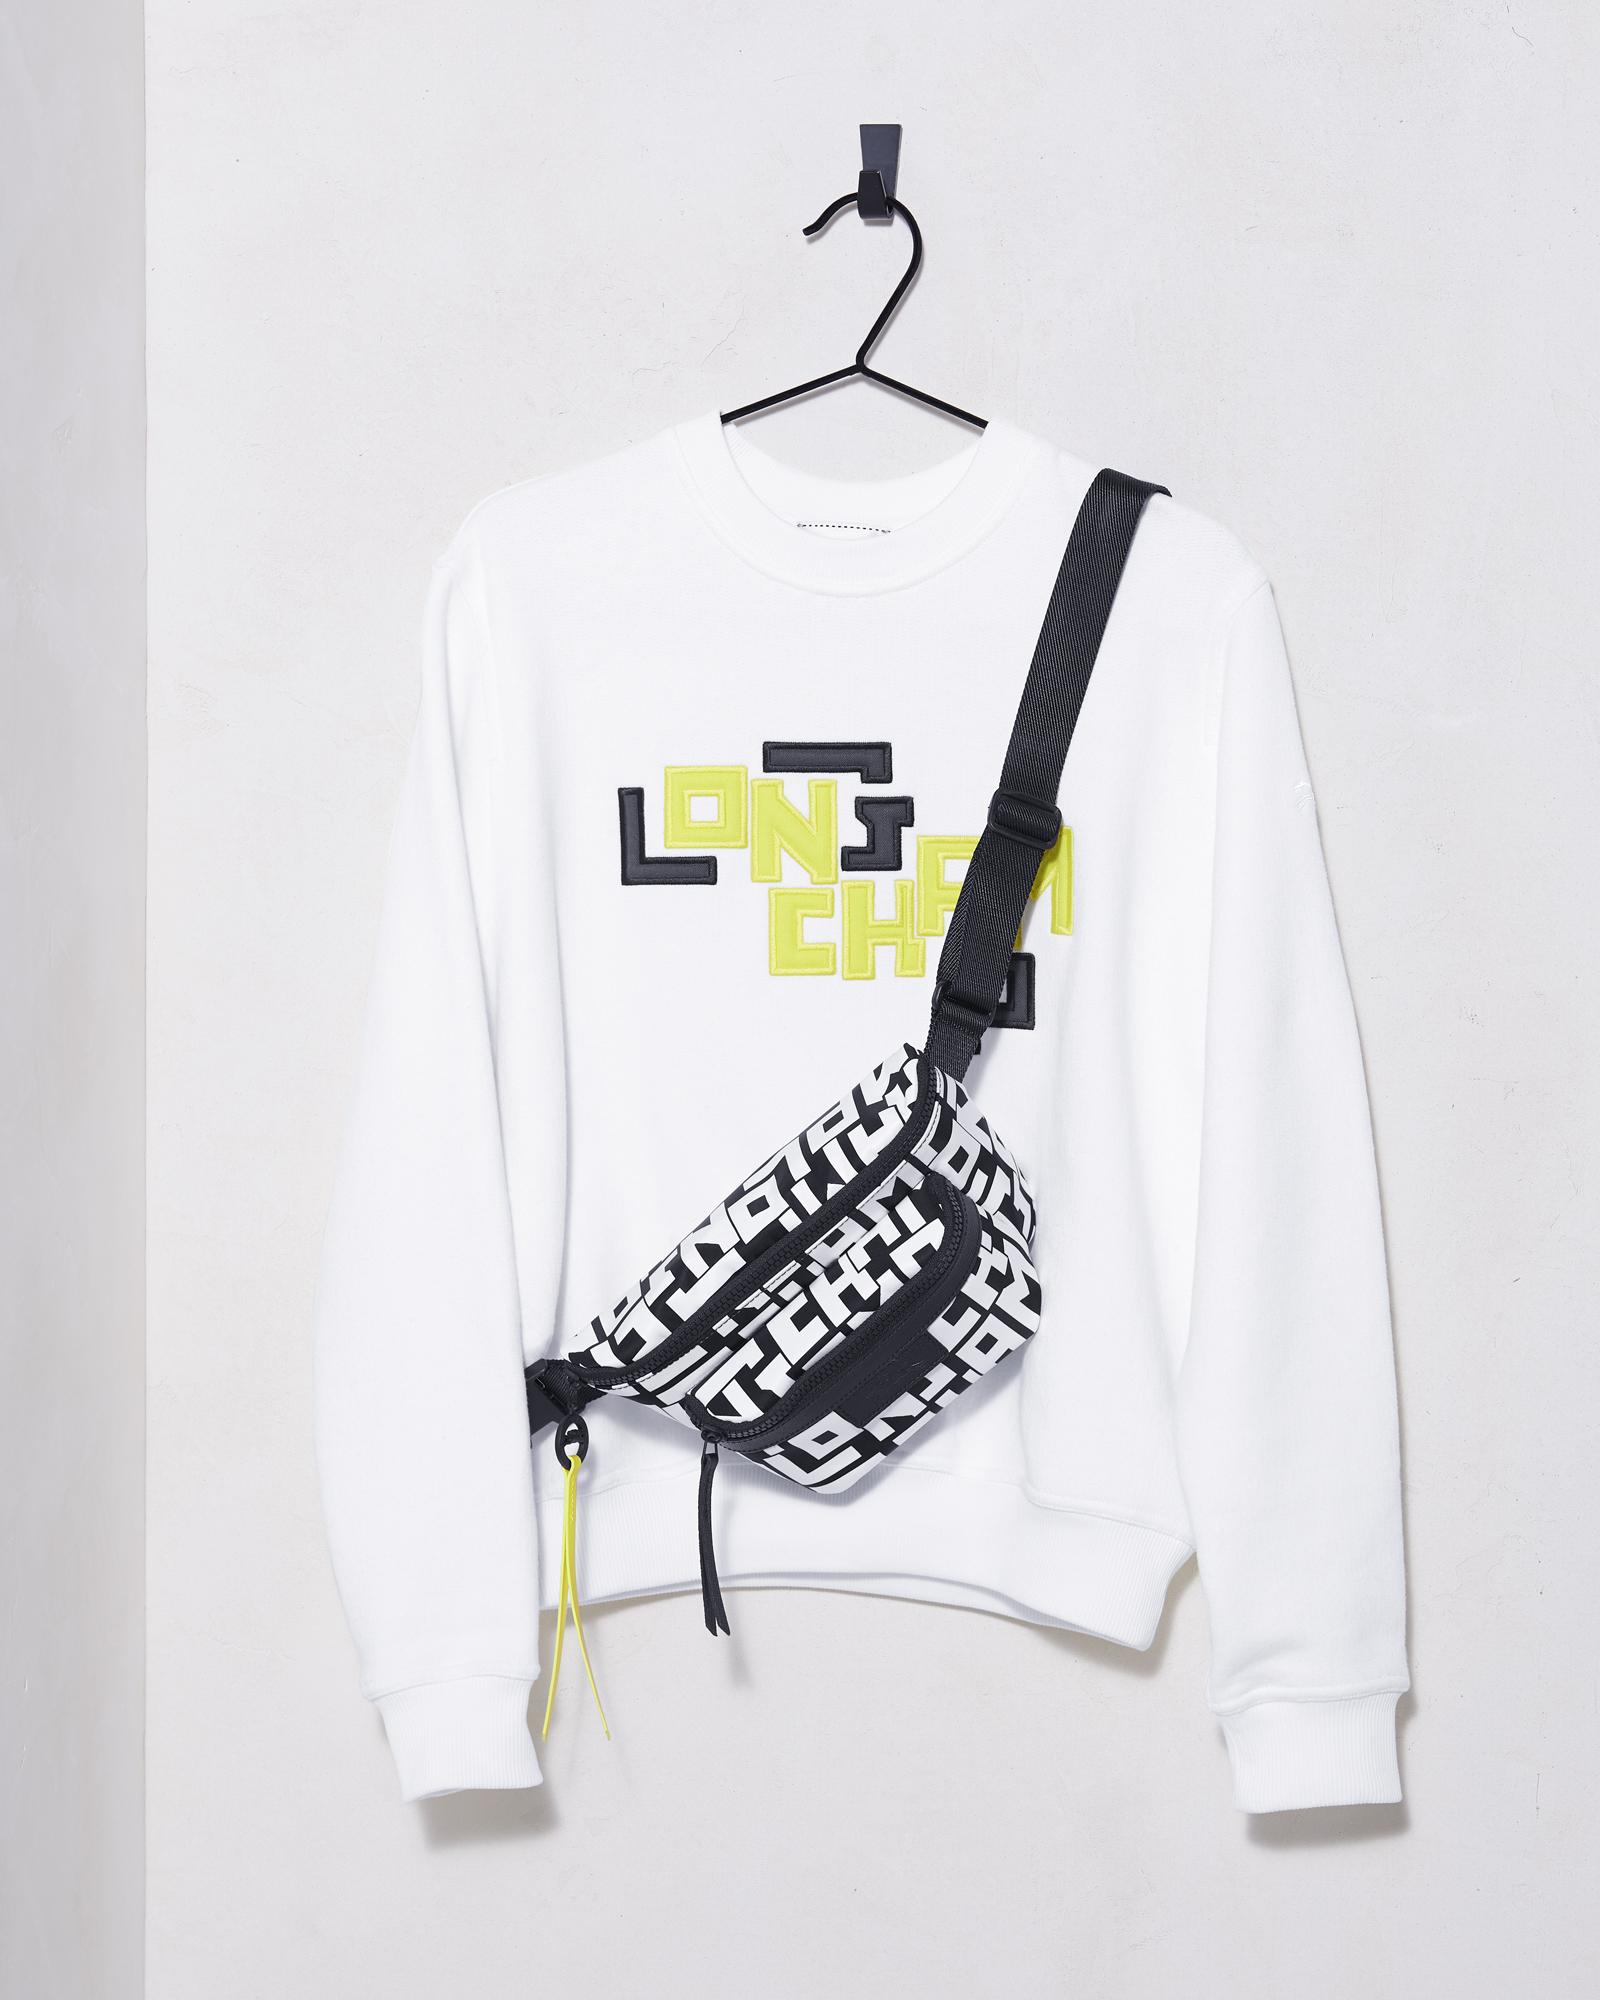 7985ca81 Le Pliage LGP Balt Bag S Black/White, $360 ; LGP Sweatshirt White,